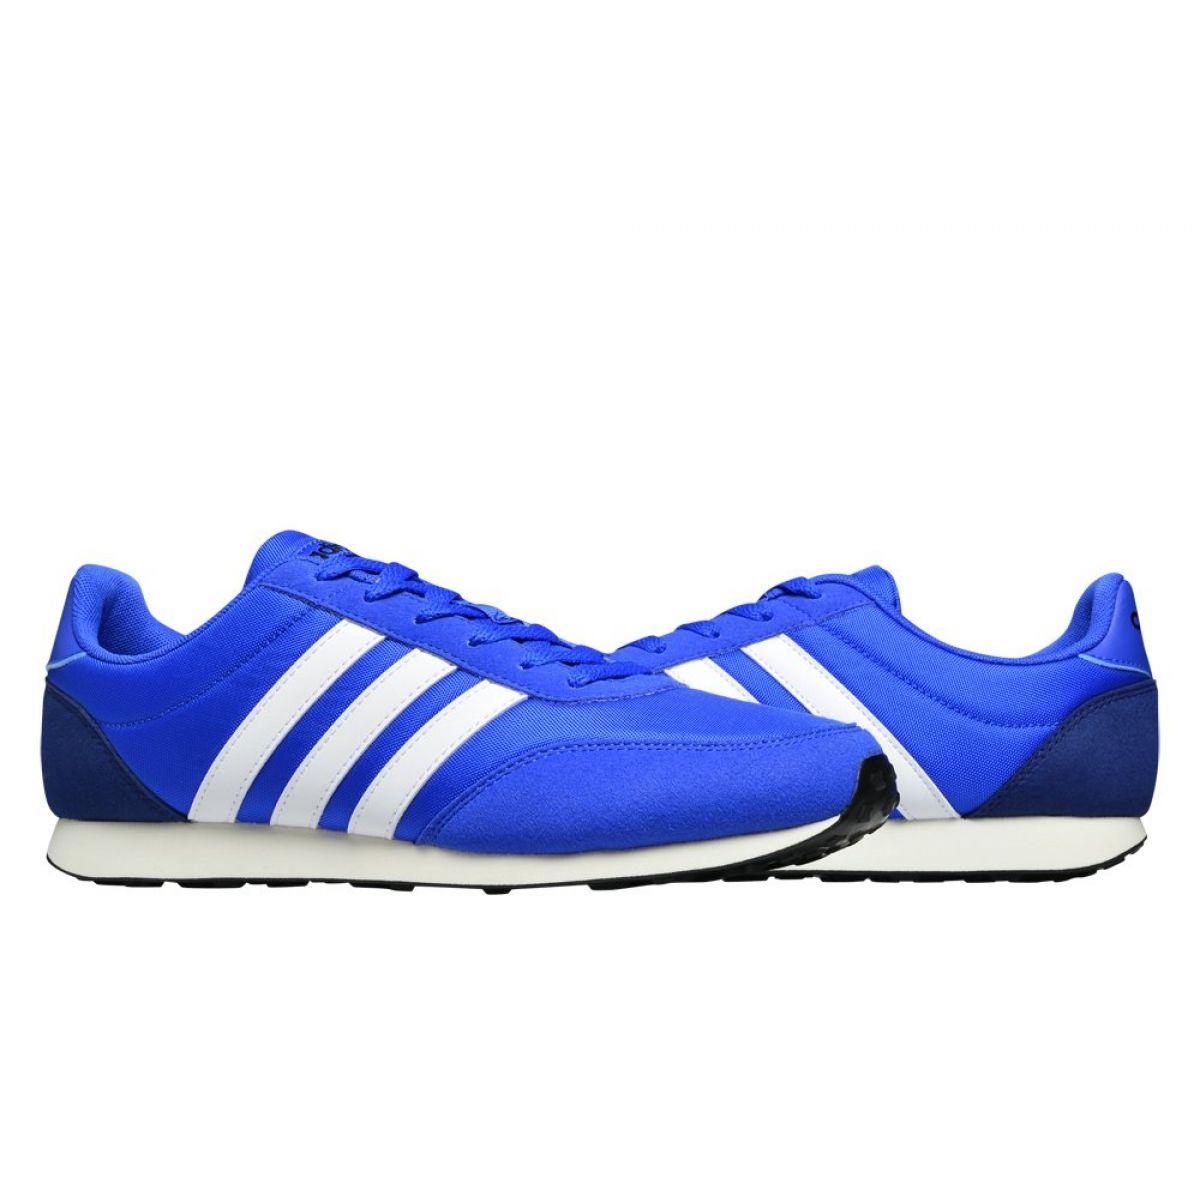 Cipő adidas V Racer 2.0 M BC0107 kék